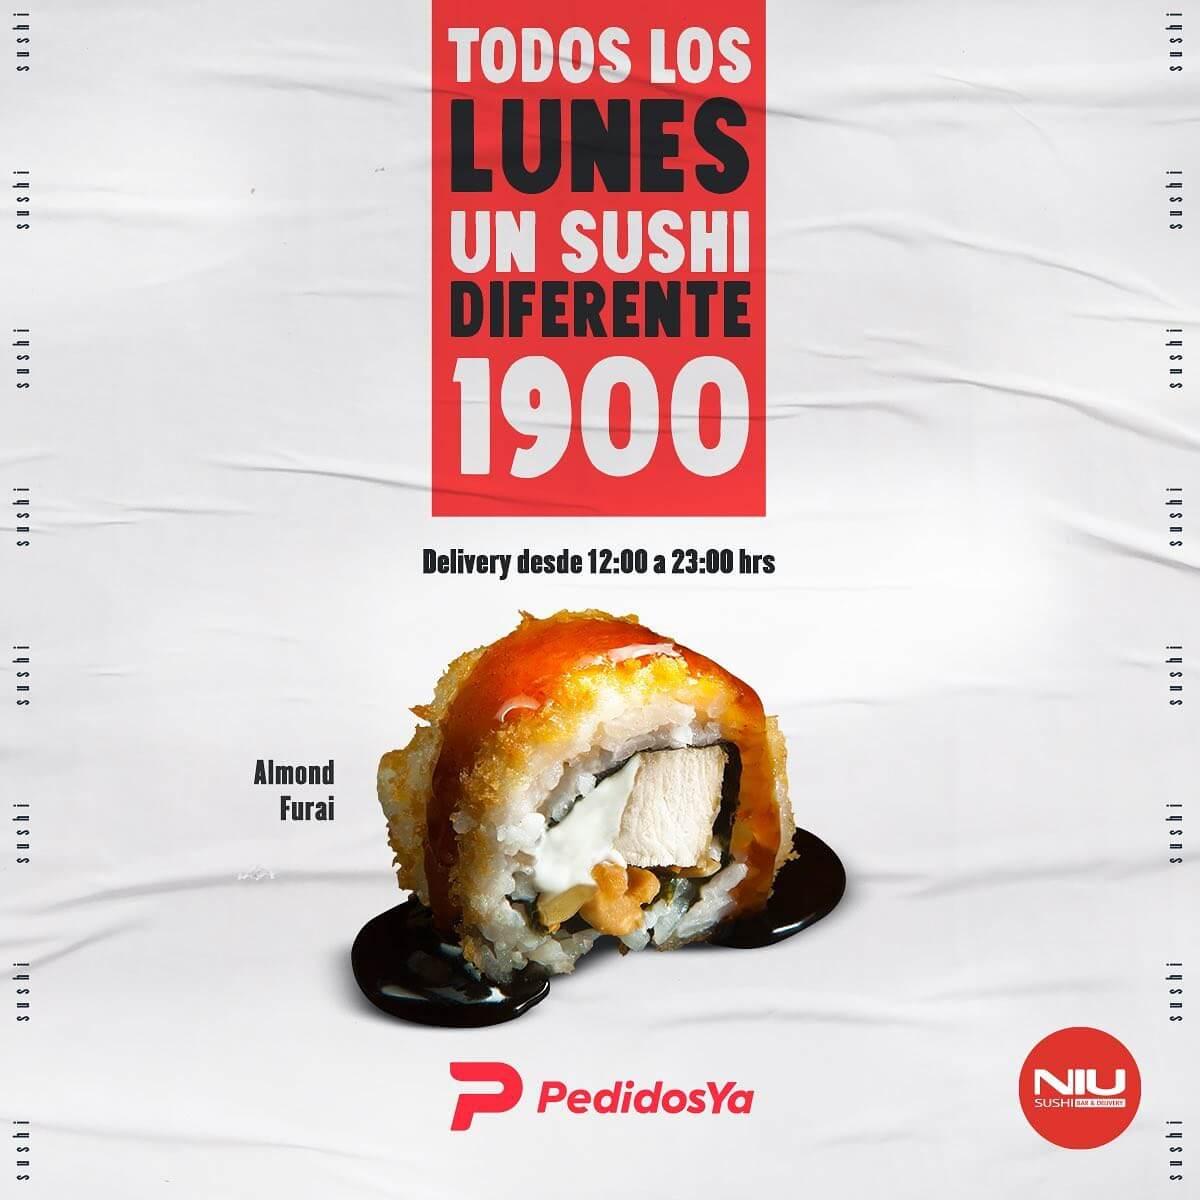 promo niu sushi